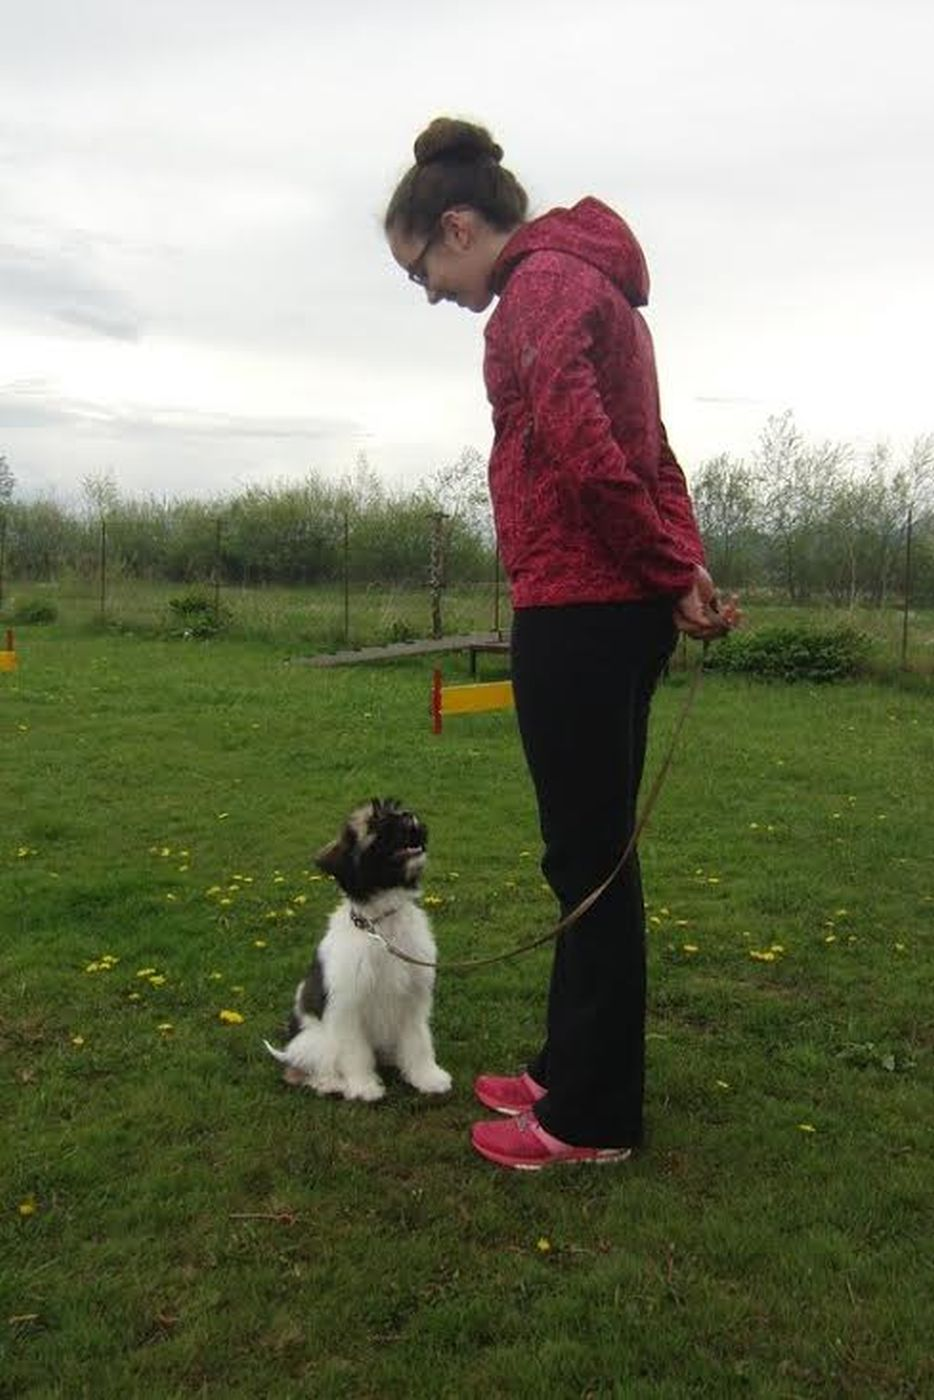 Pasja šola Švrk - pozornost psa